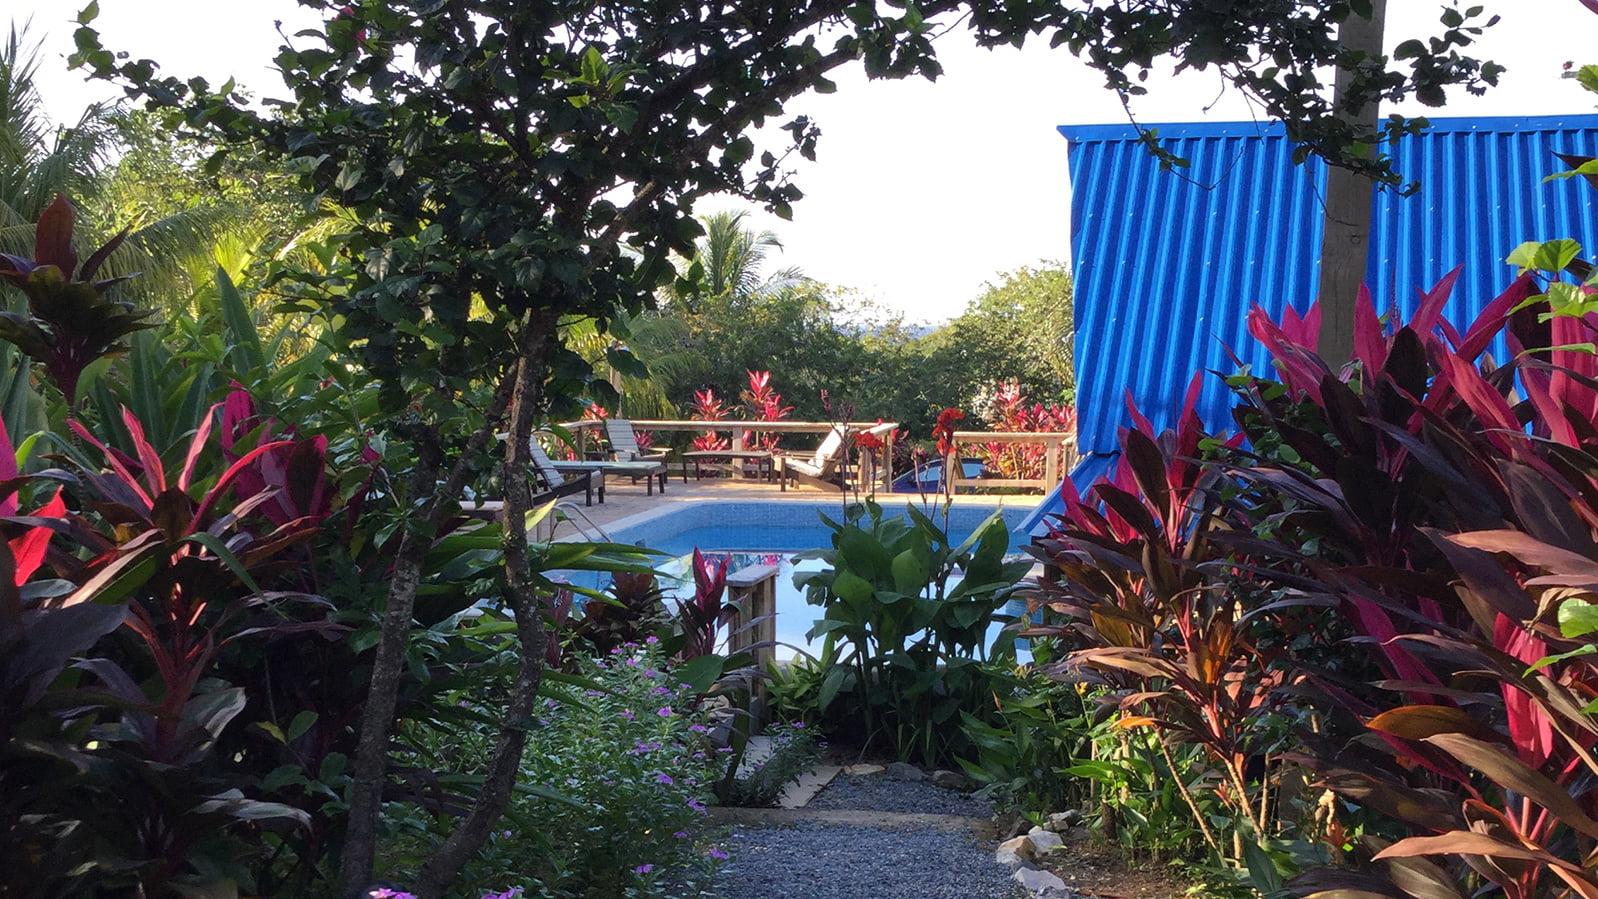 http://roatan-guavagrove.com/wp-content/uploads/2016/05/guava-grove-patio.jpg